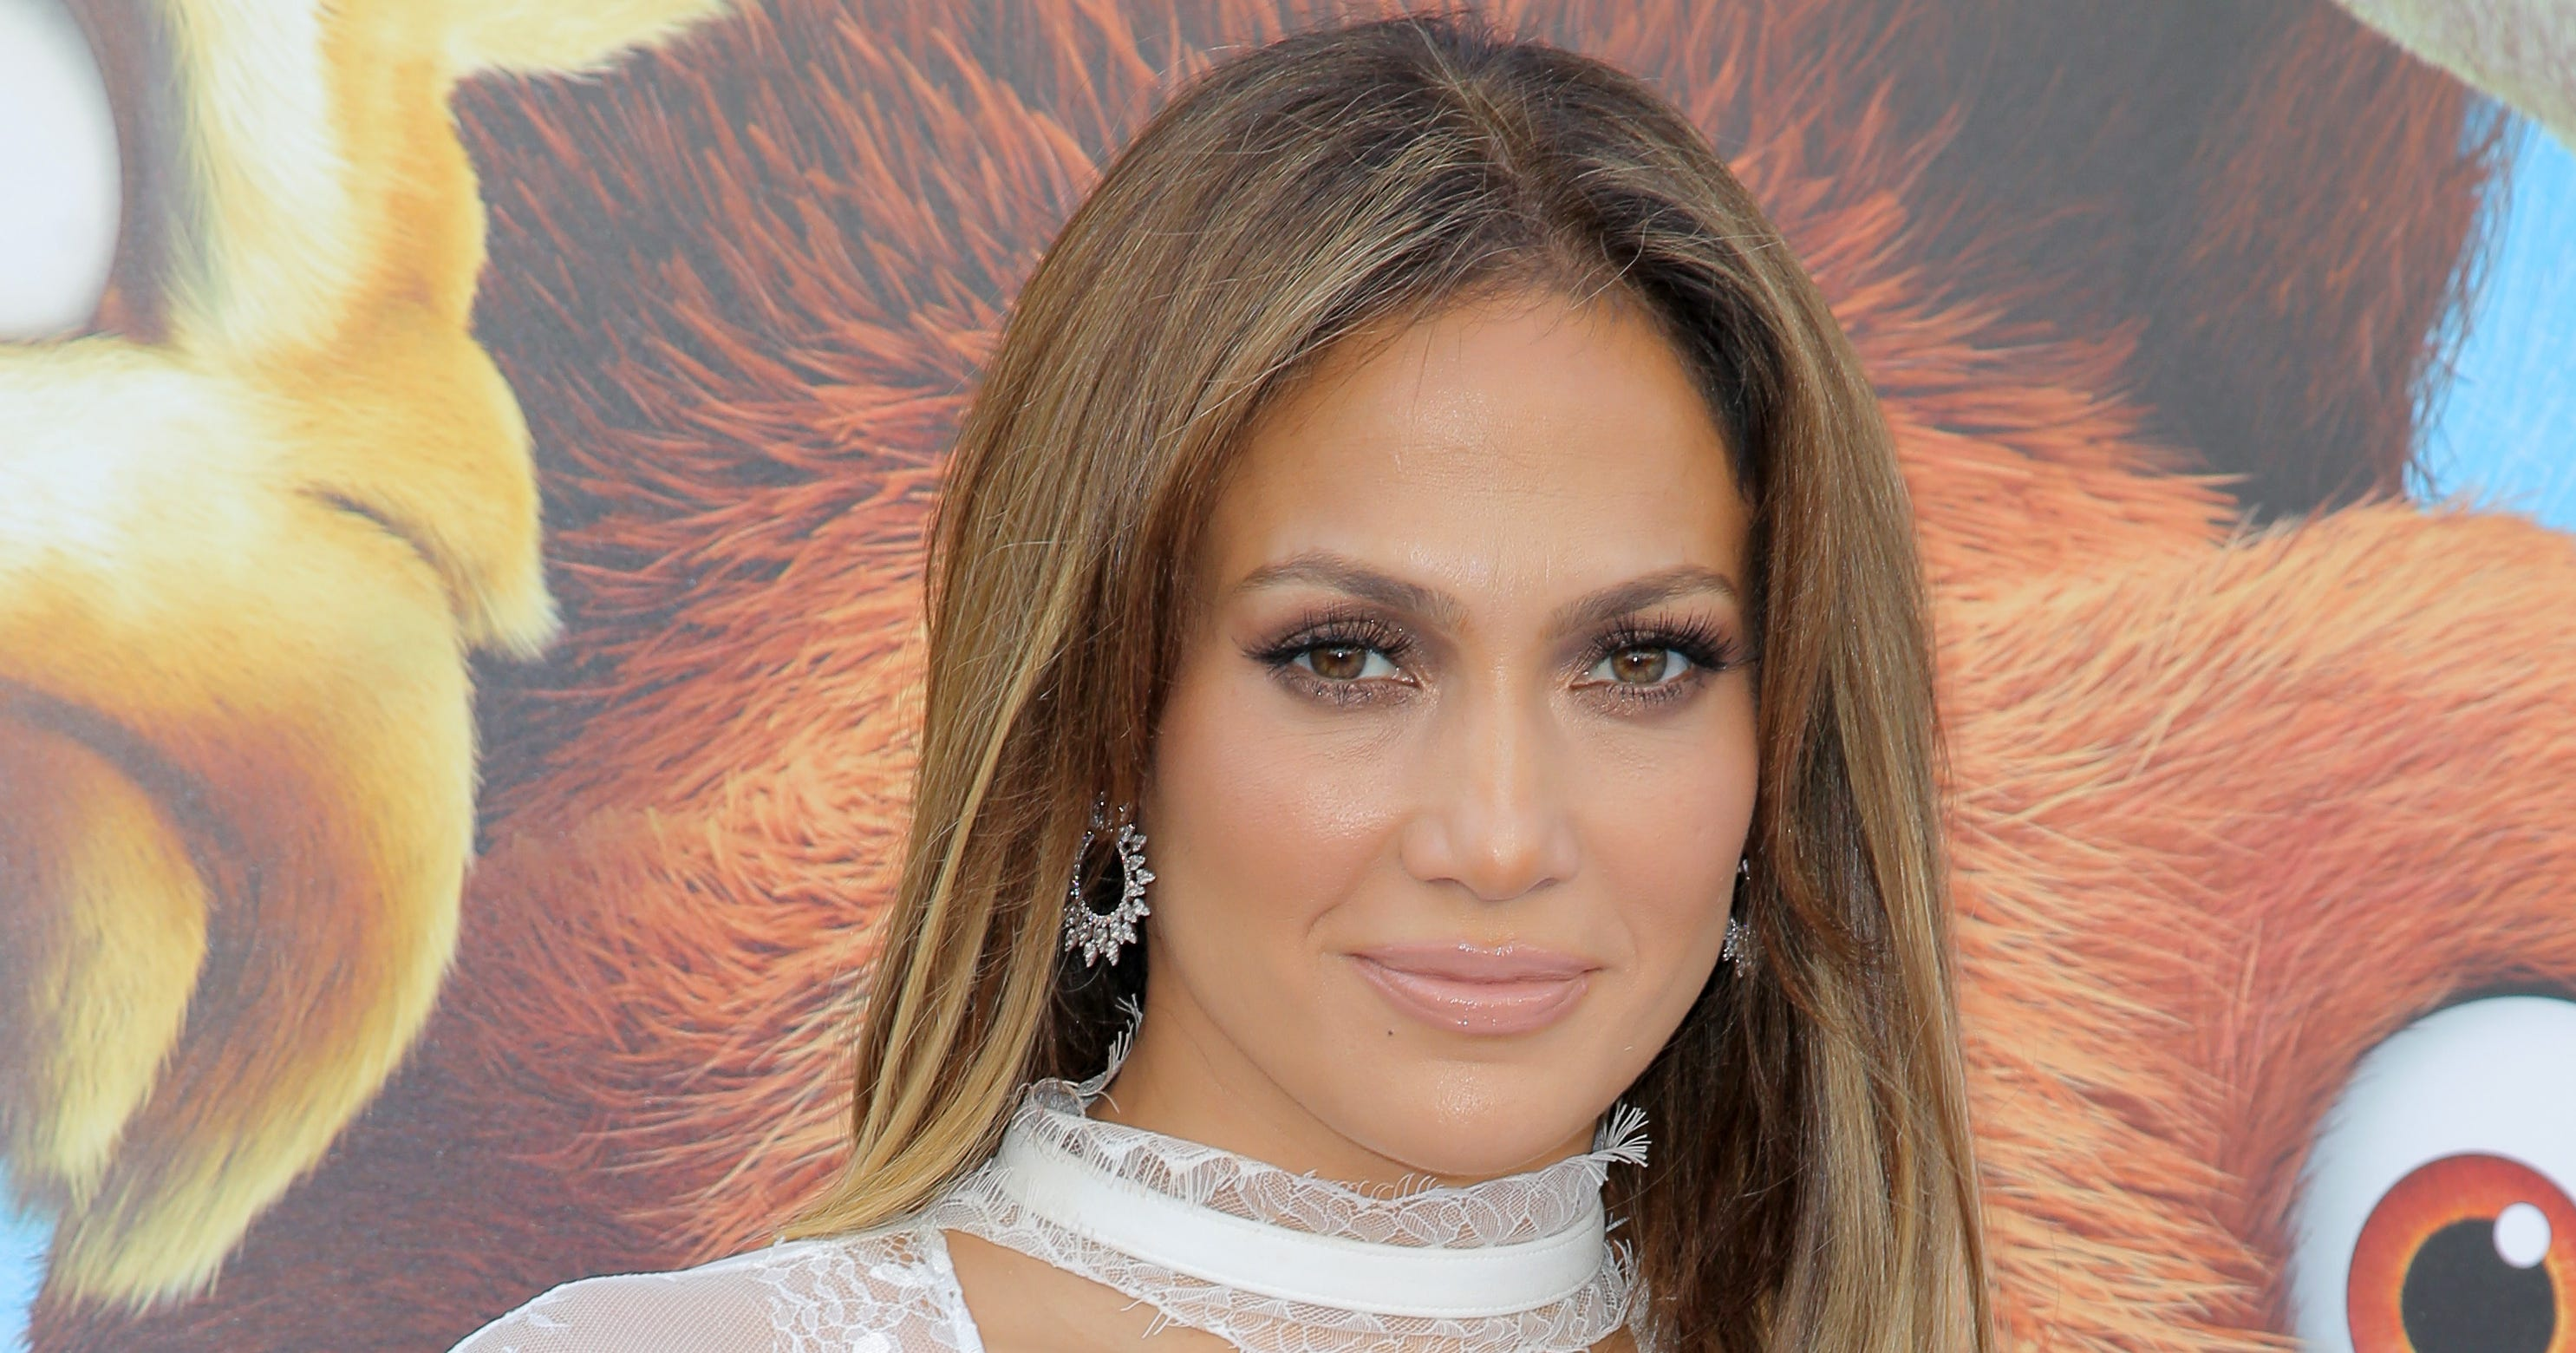 Jennifer Lopez Will Star In NBC's Next Big Musical (But Please, No Pitbull)